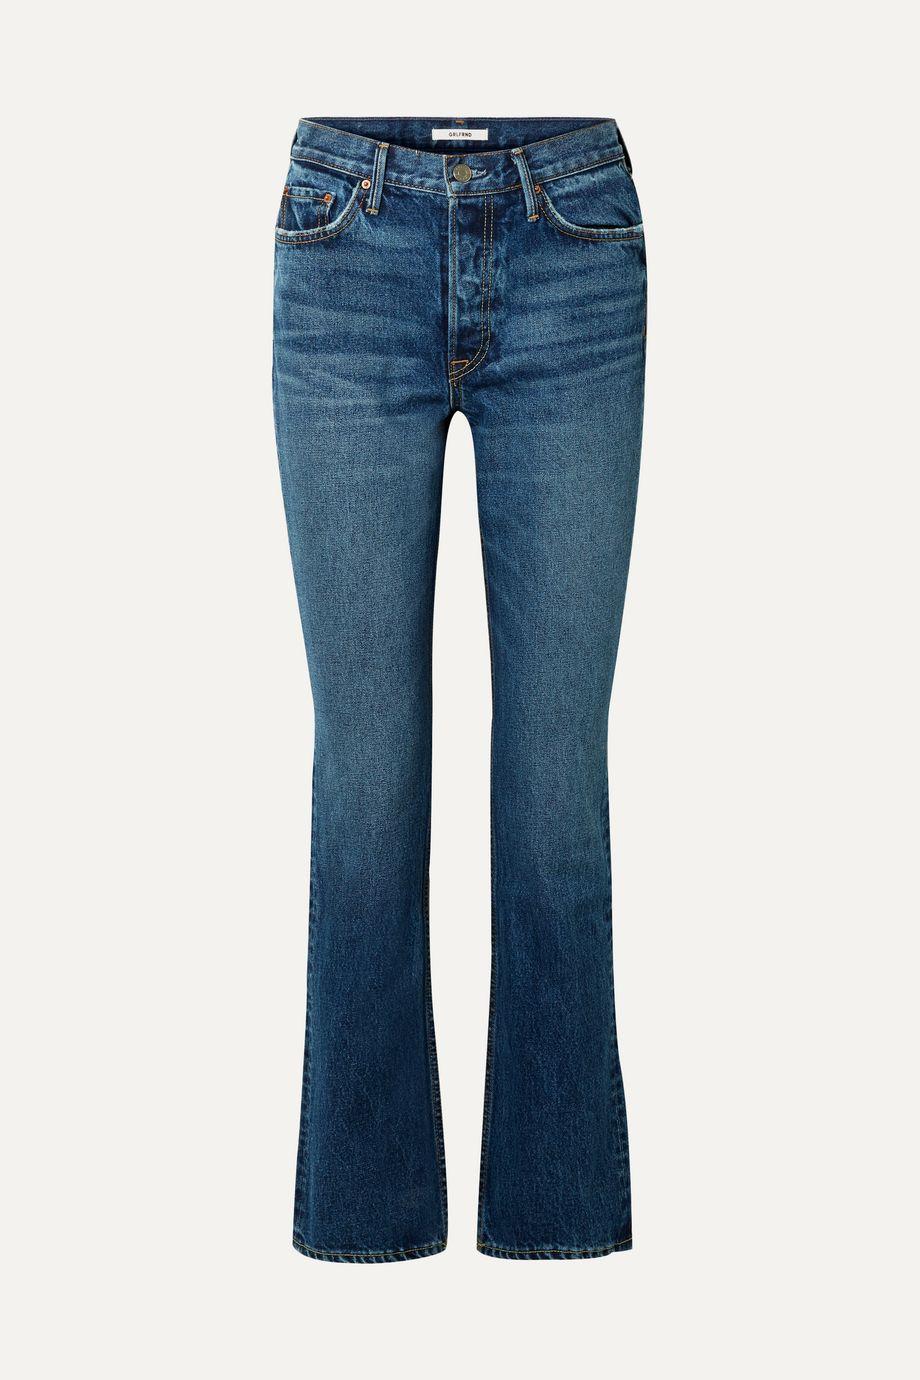 GRLFRND Sunny high-rise flared jeans